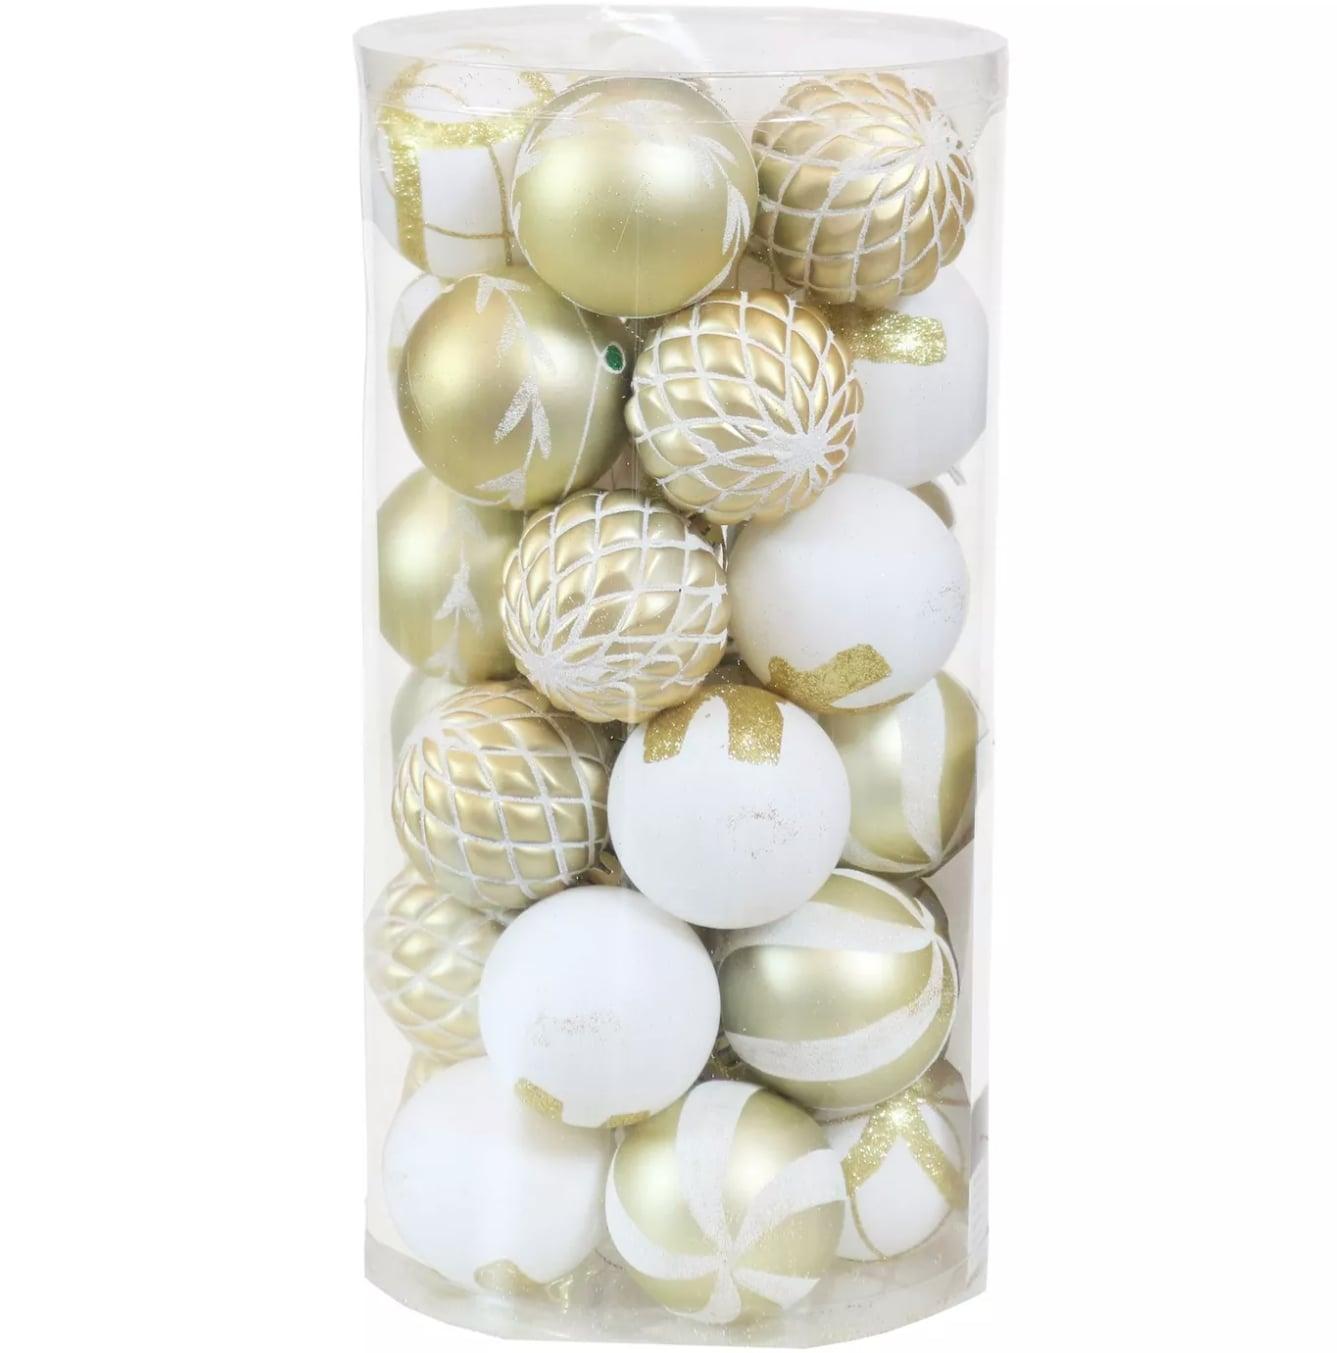 Shatterproof Christmas Ornaments Popsugar Home